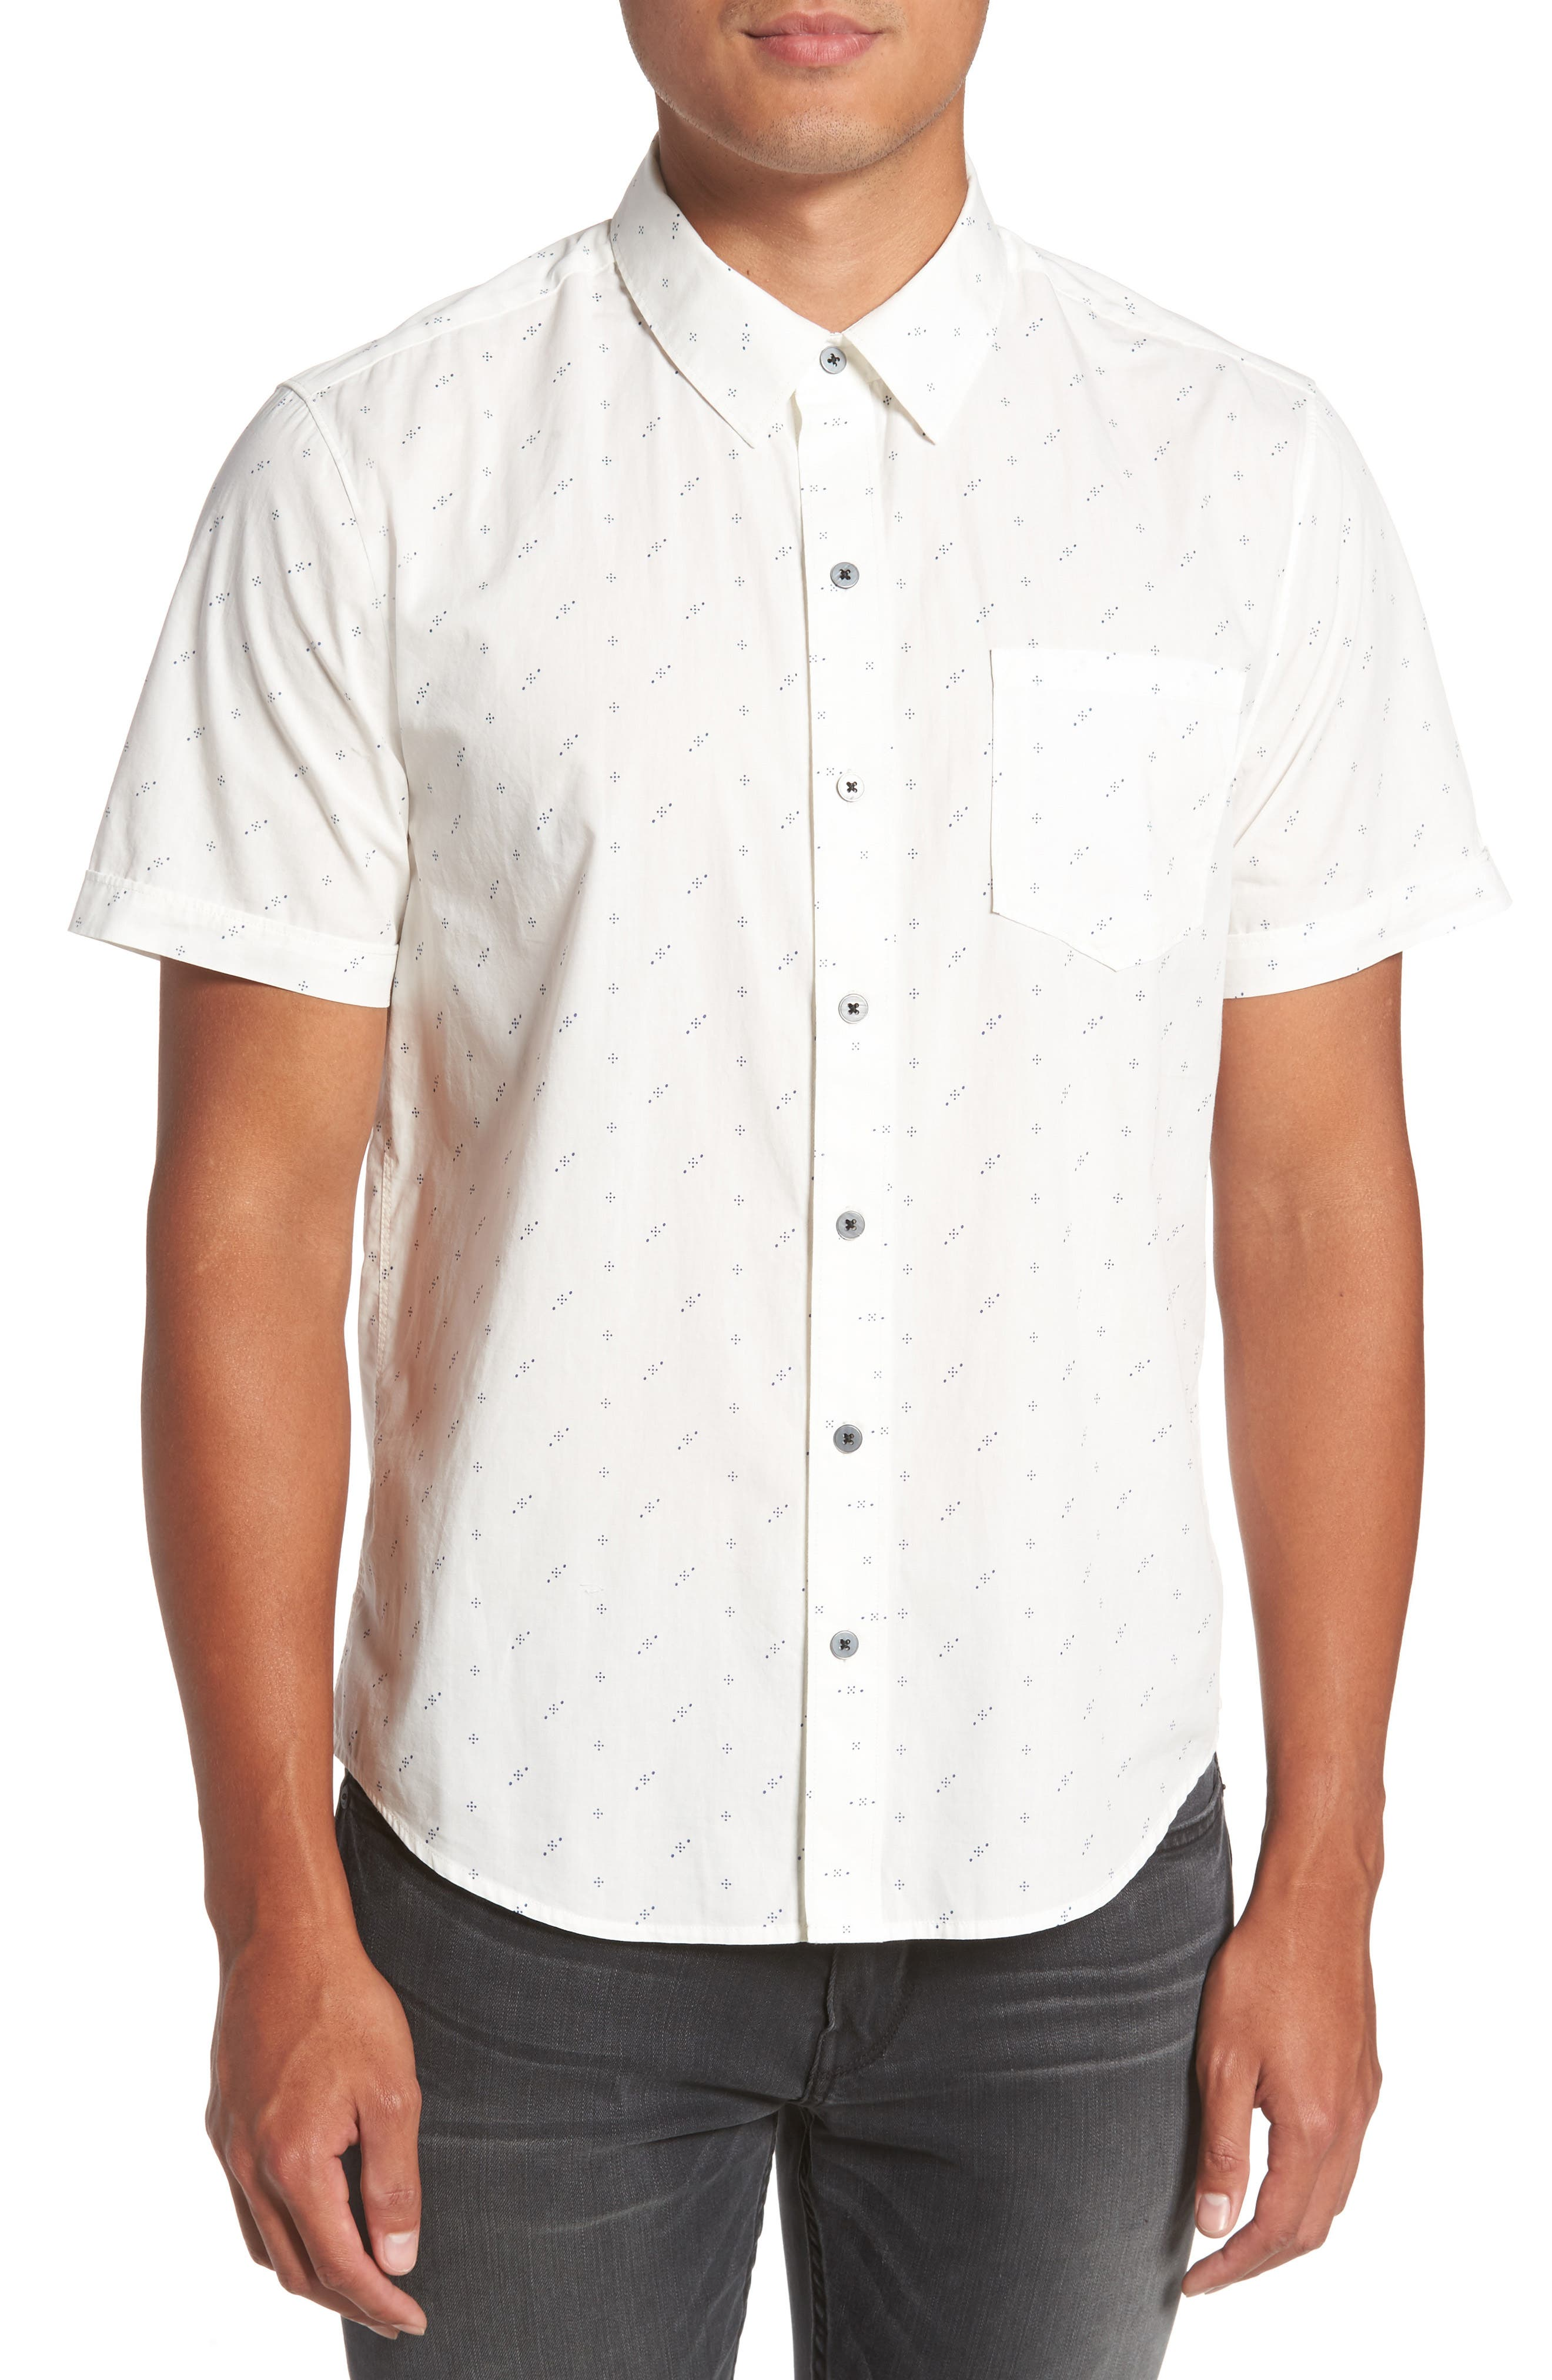 Becker Dot Print Woven Shirt,                             Main thumbnail 1, color,                             140